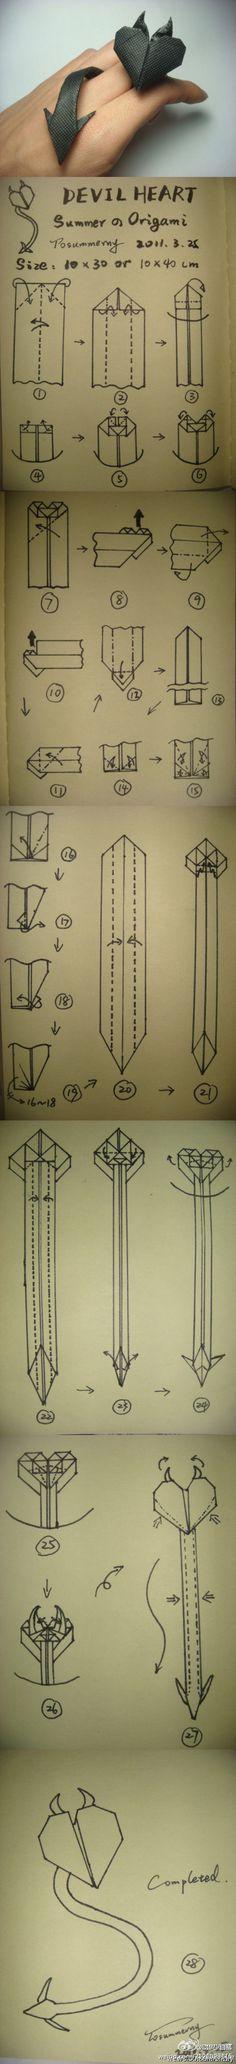 Devilheart Origami...my idea of the perfect Valentine's decoration